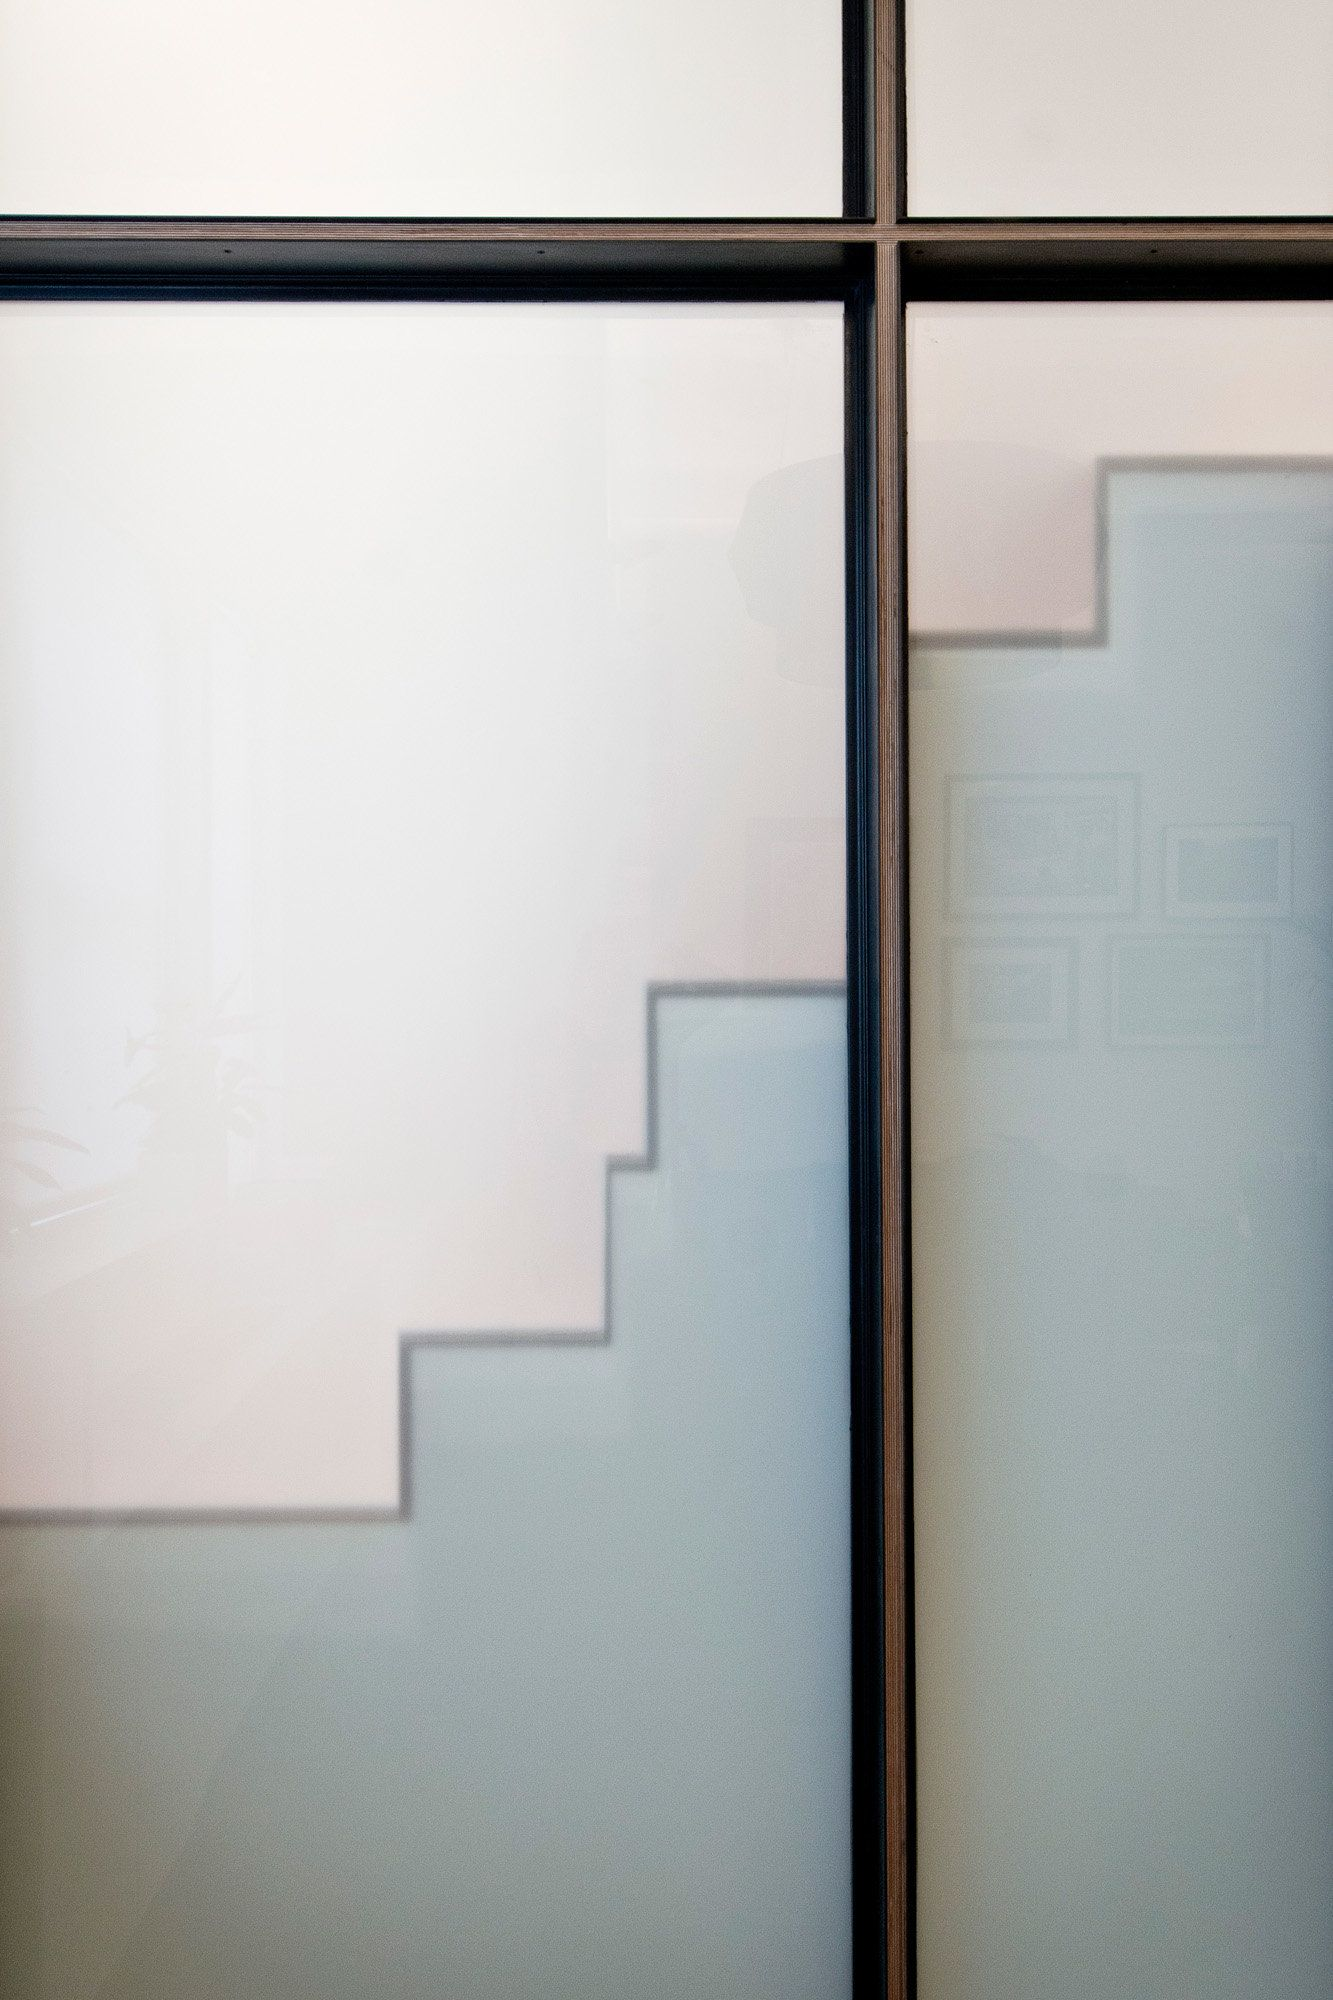 Alternating Interior Angles